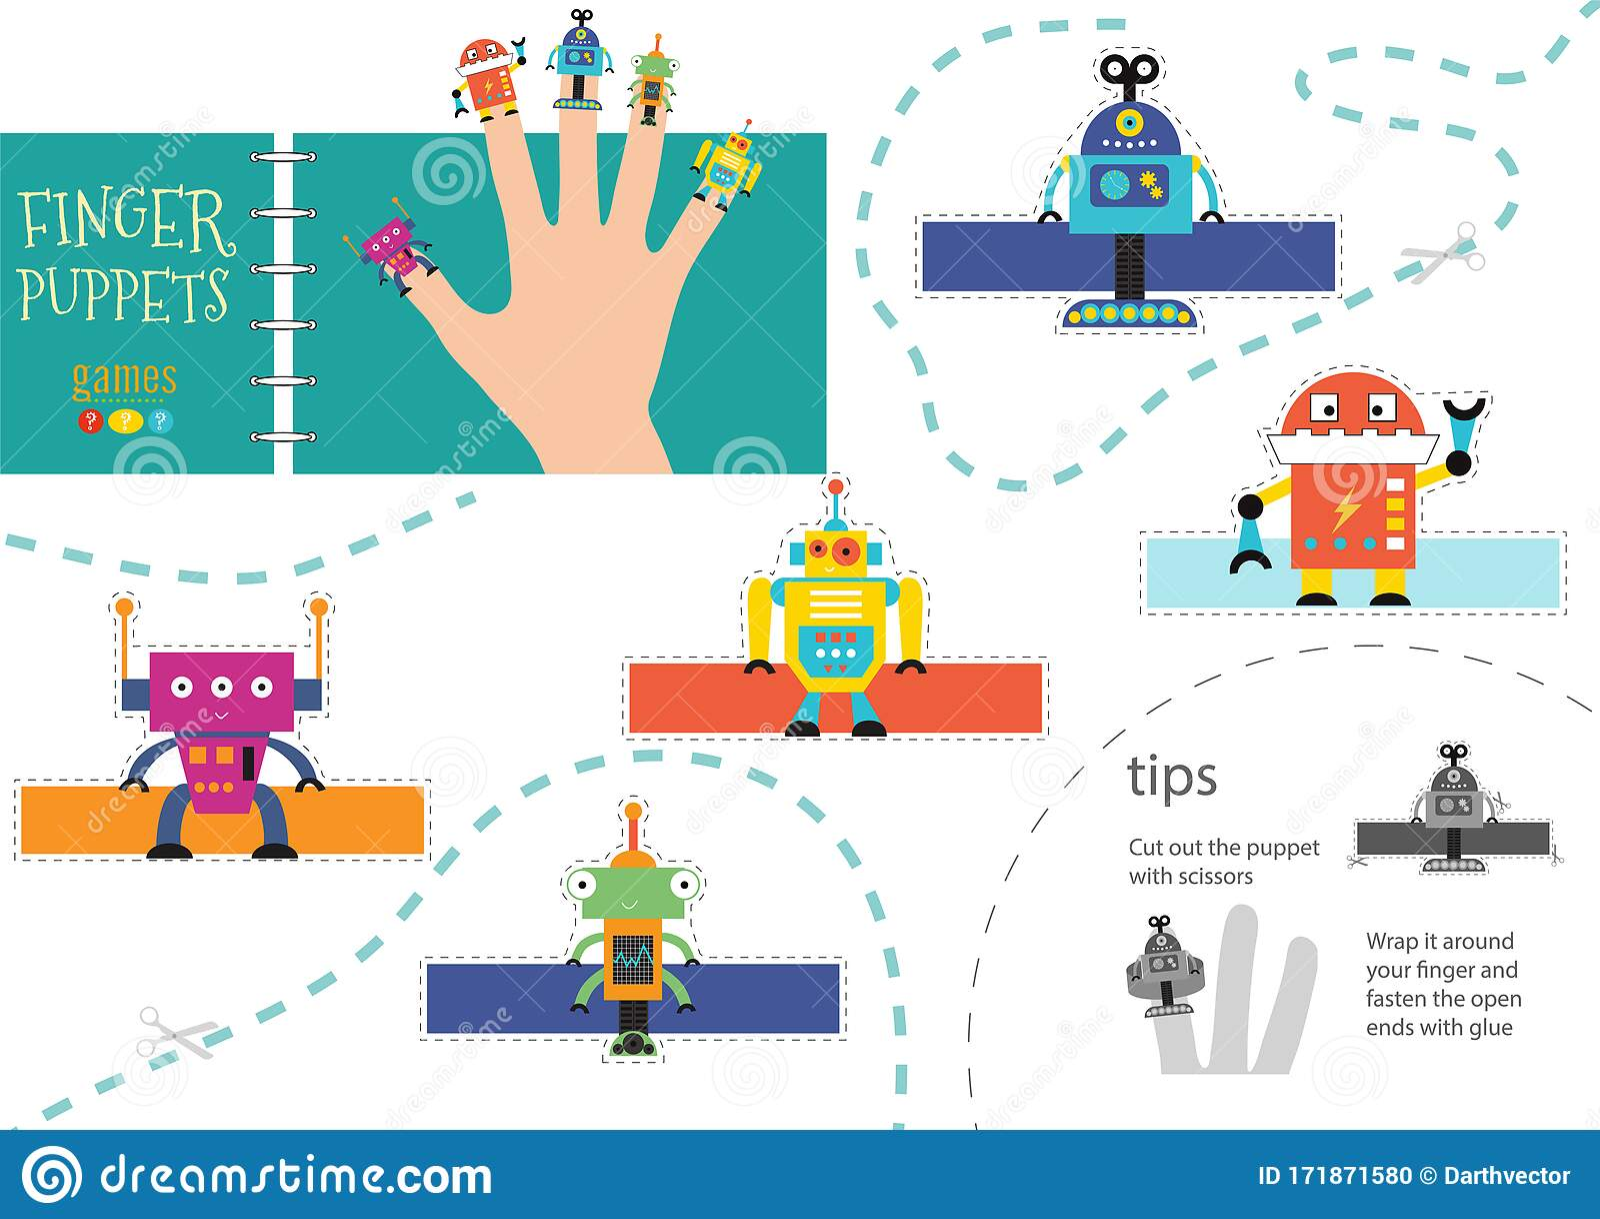 5 Finger Puppet Vector Robots Cutout Educational